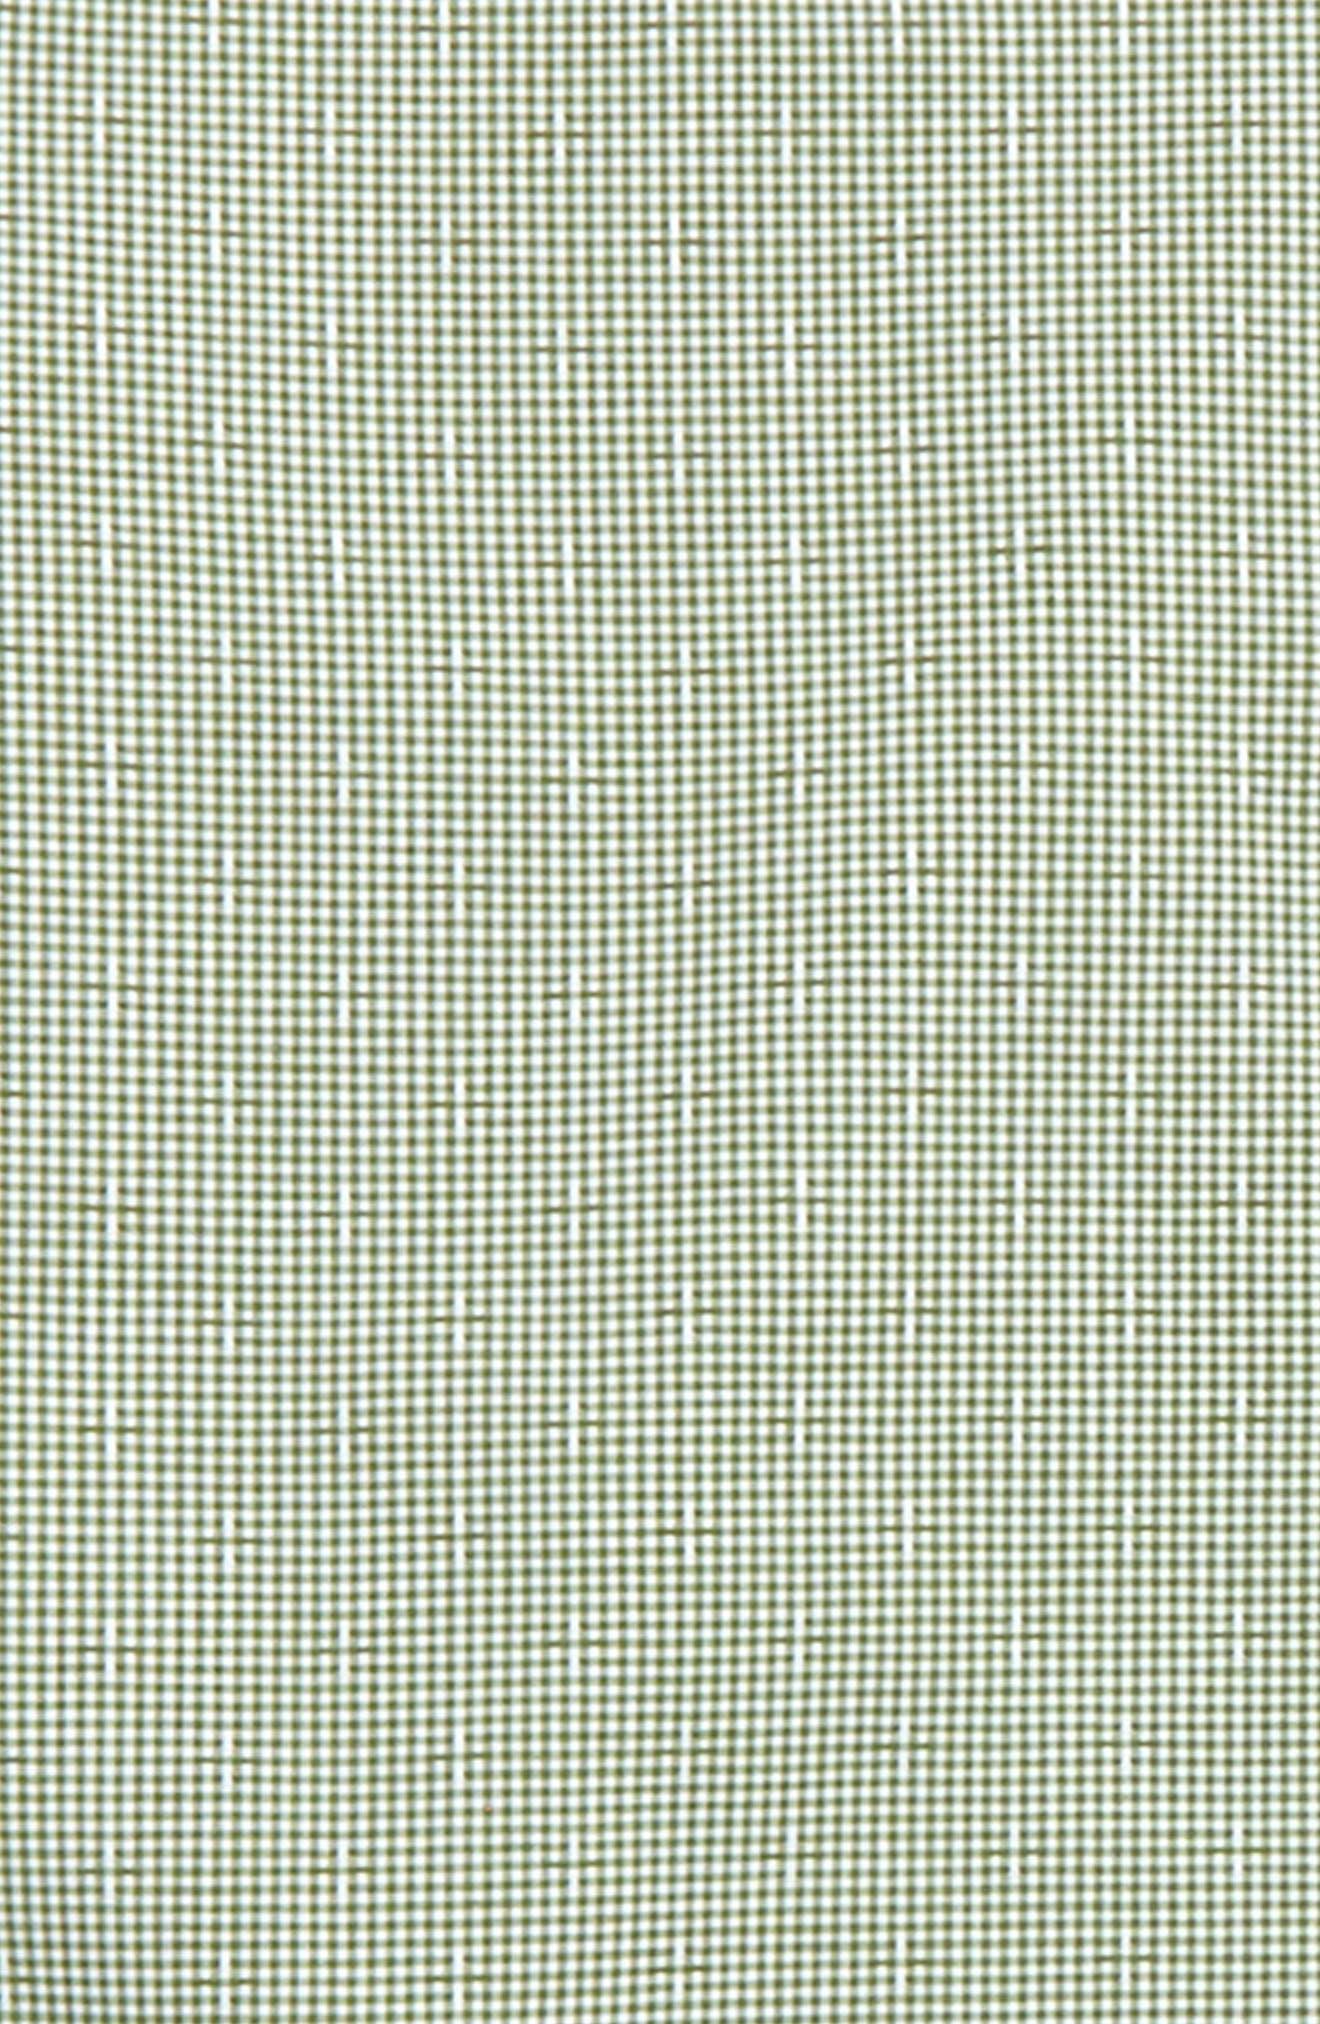 Microcheck Dress Shirt,                             Alternate thumbnail 2, color,                             Green